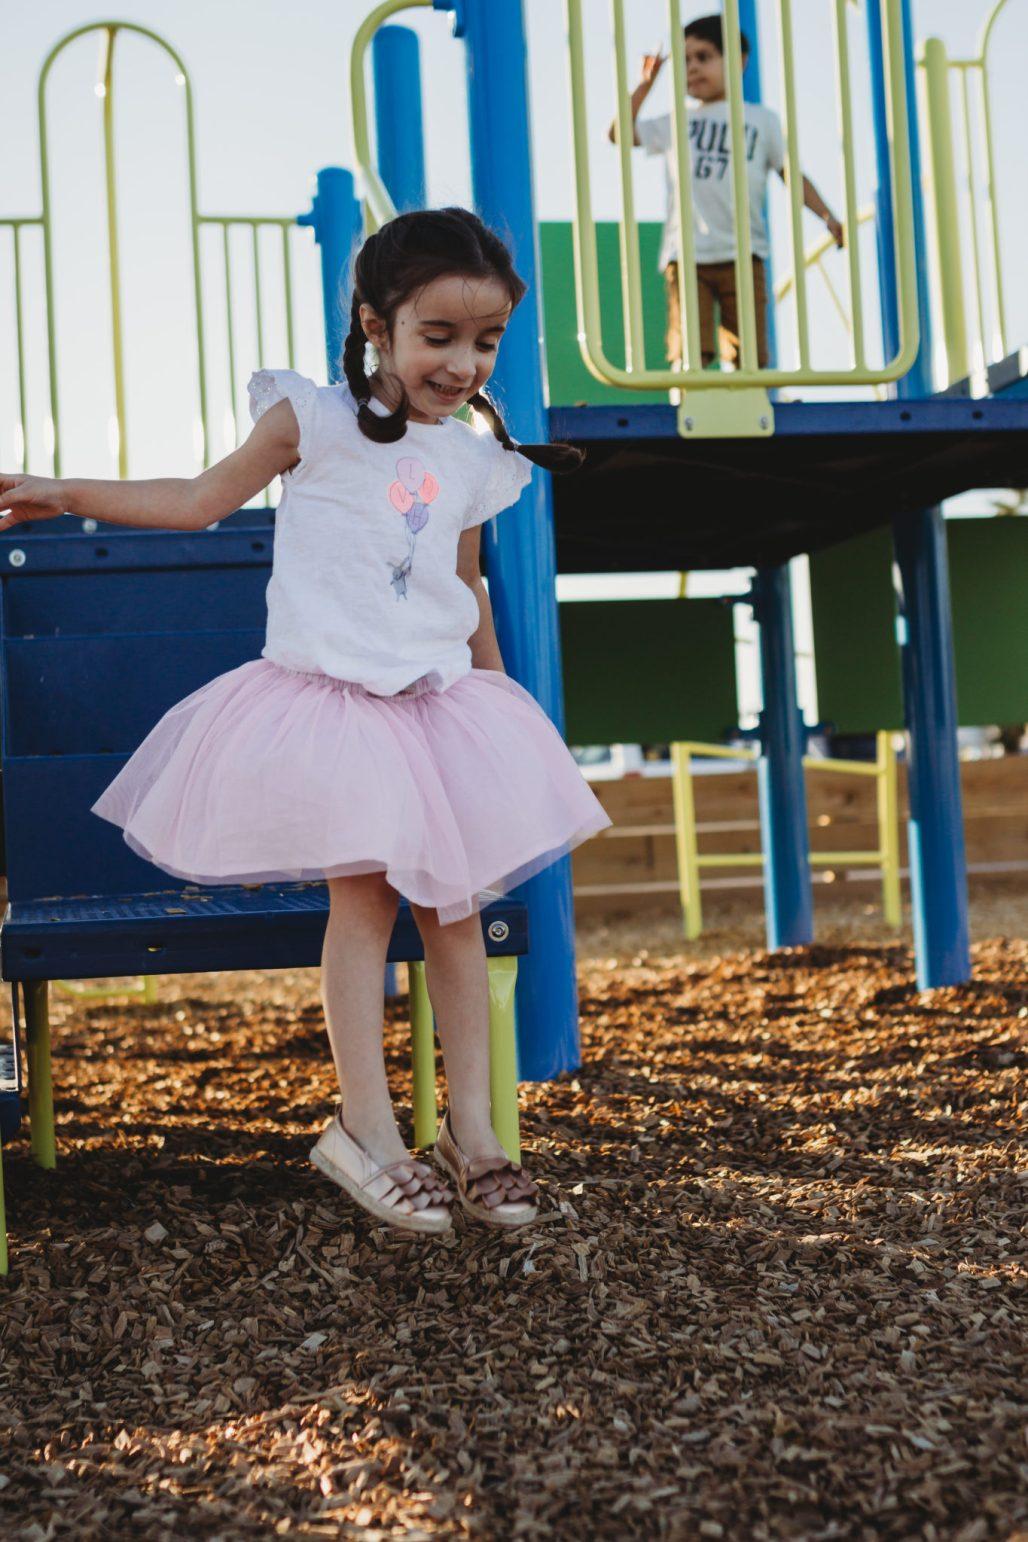 #ad #BringtheFun #OshKoshKids toddler spring fashion, style for toddlers, spring fashion for preschoolers, kids spring and summer fashion with OshKosh B'gosh